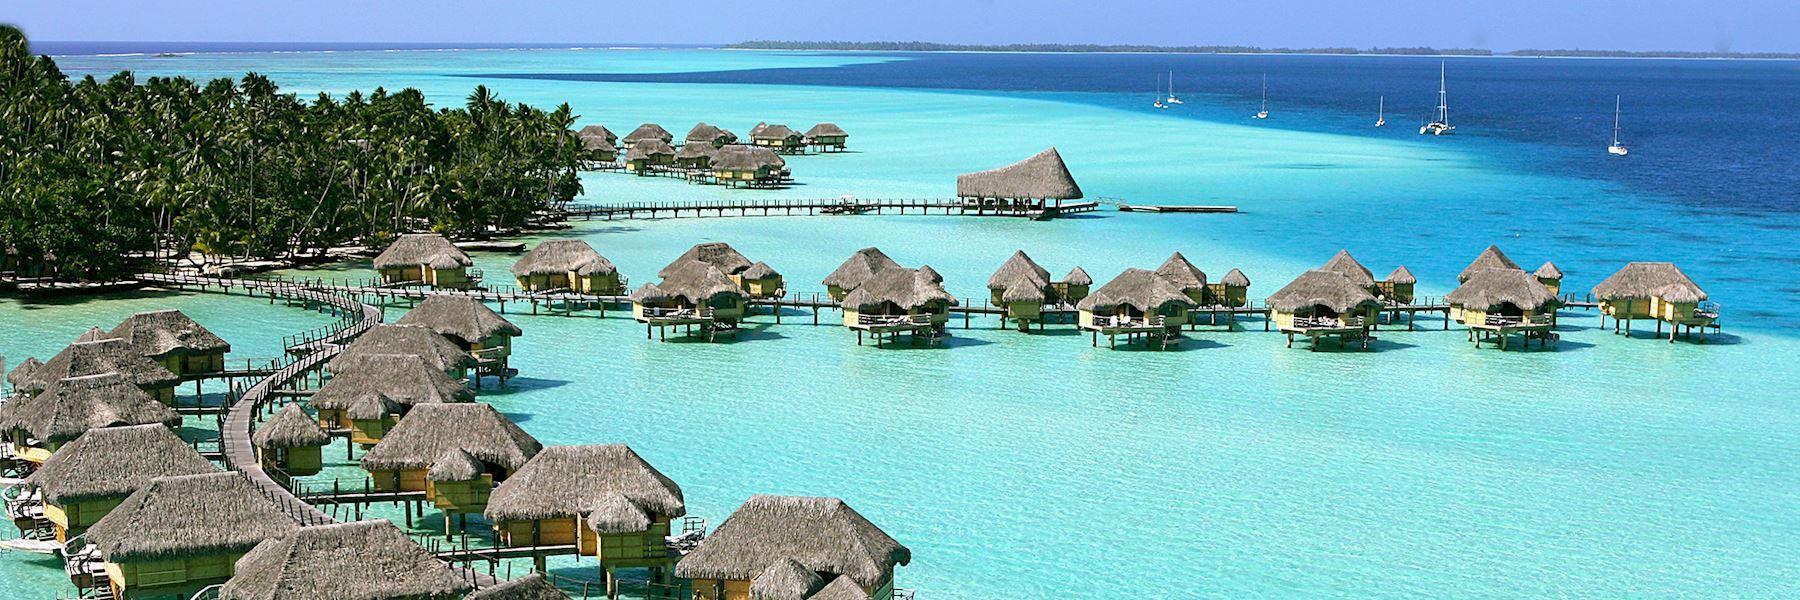 French Polynesia holidays & honeymoons